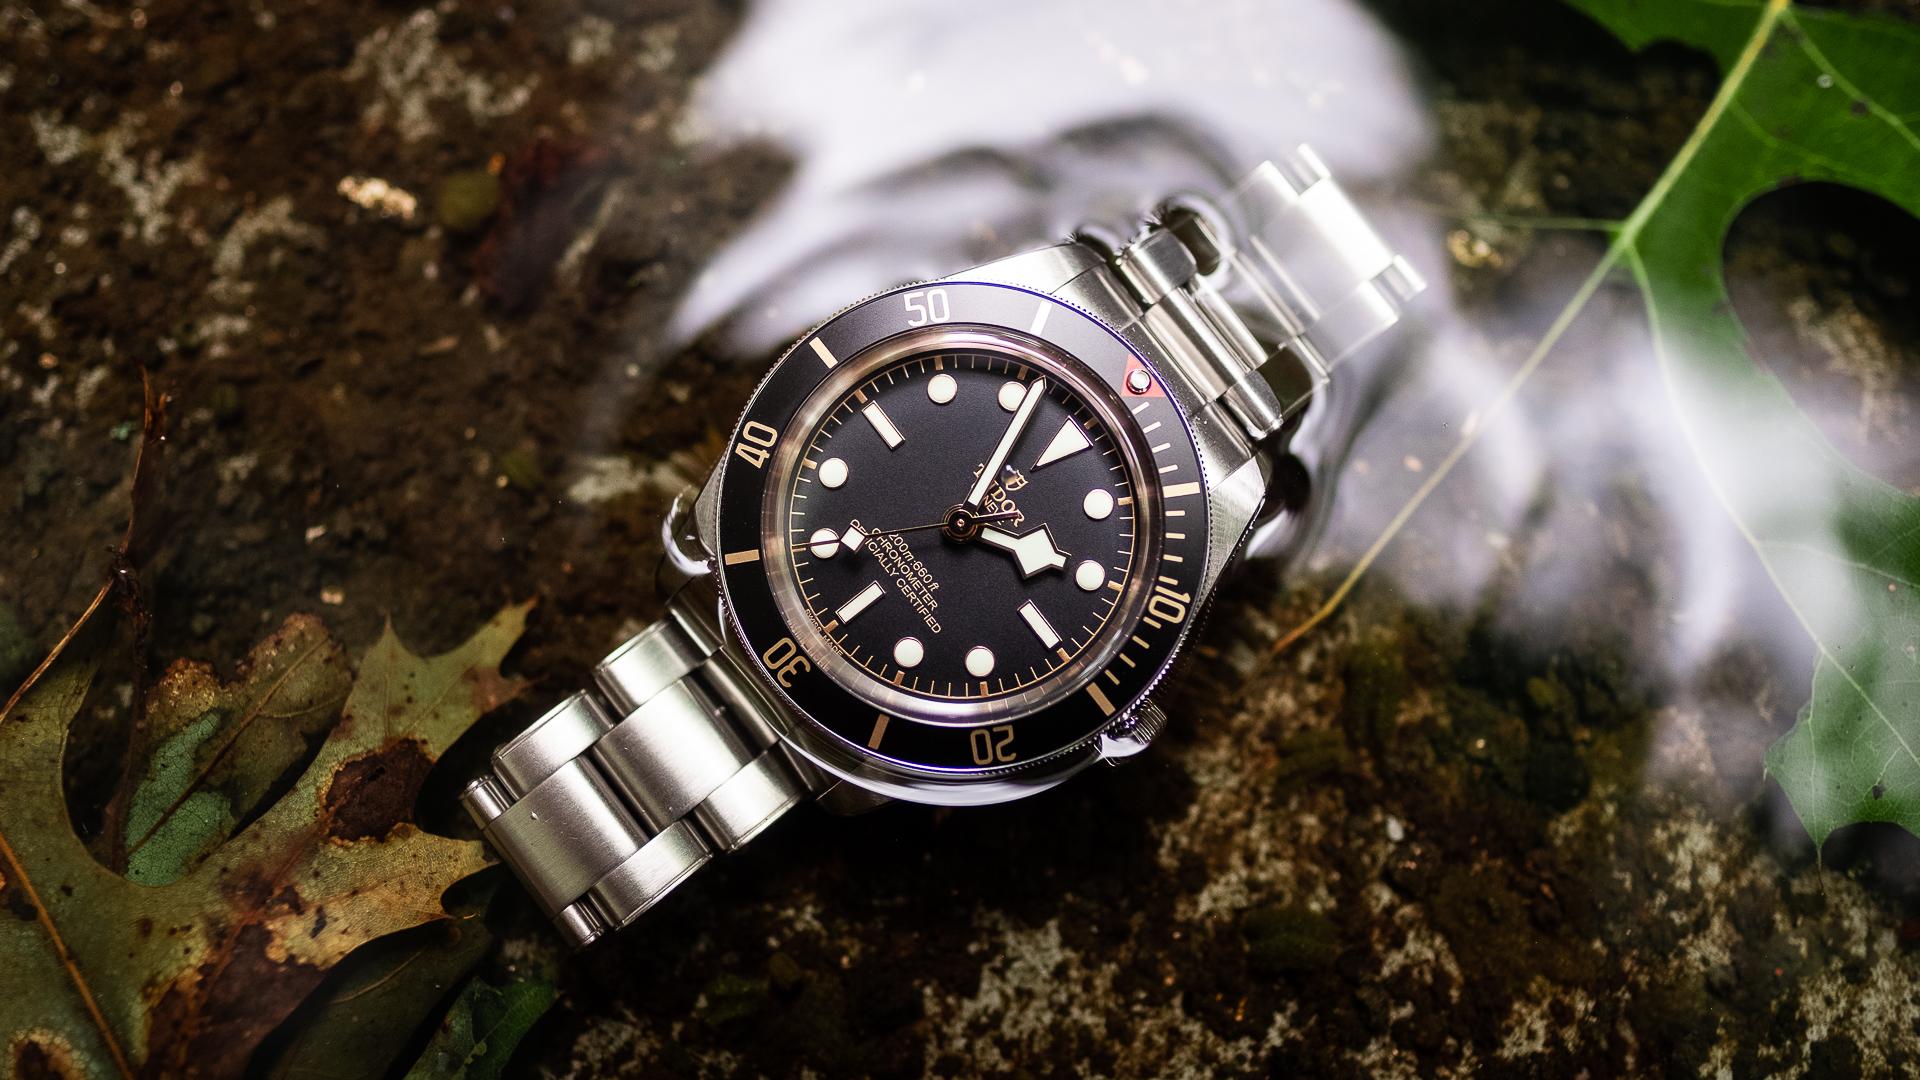 In Depth Wrist Watch Reviews Wrist Time Reviews